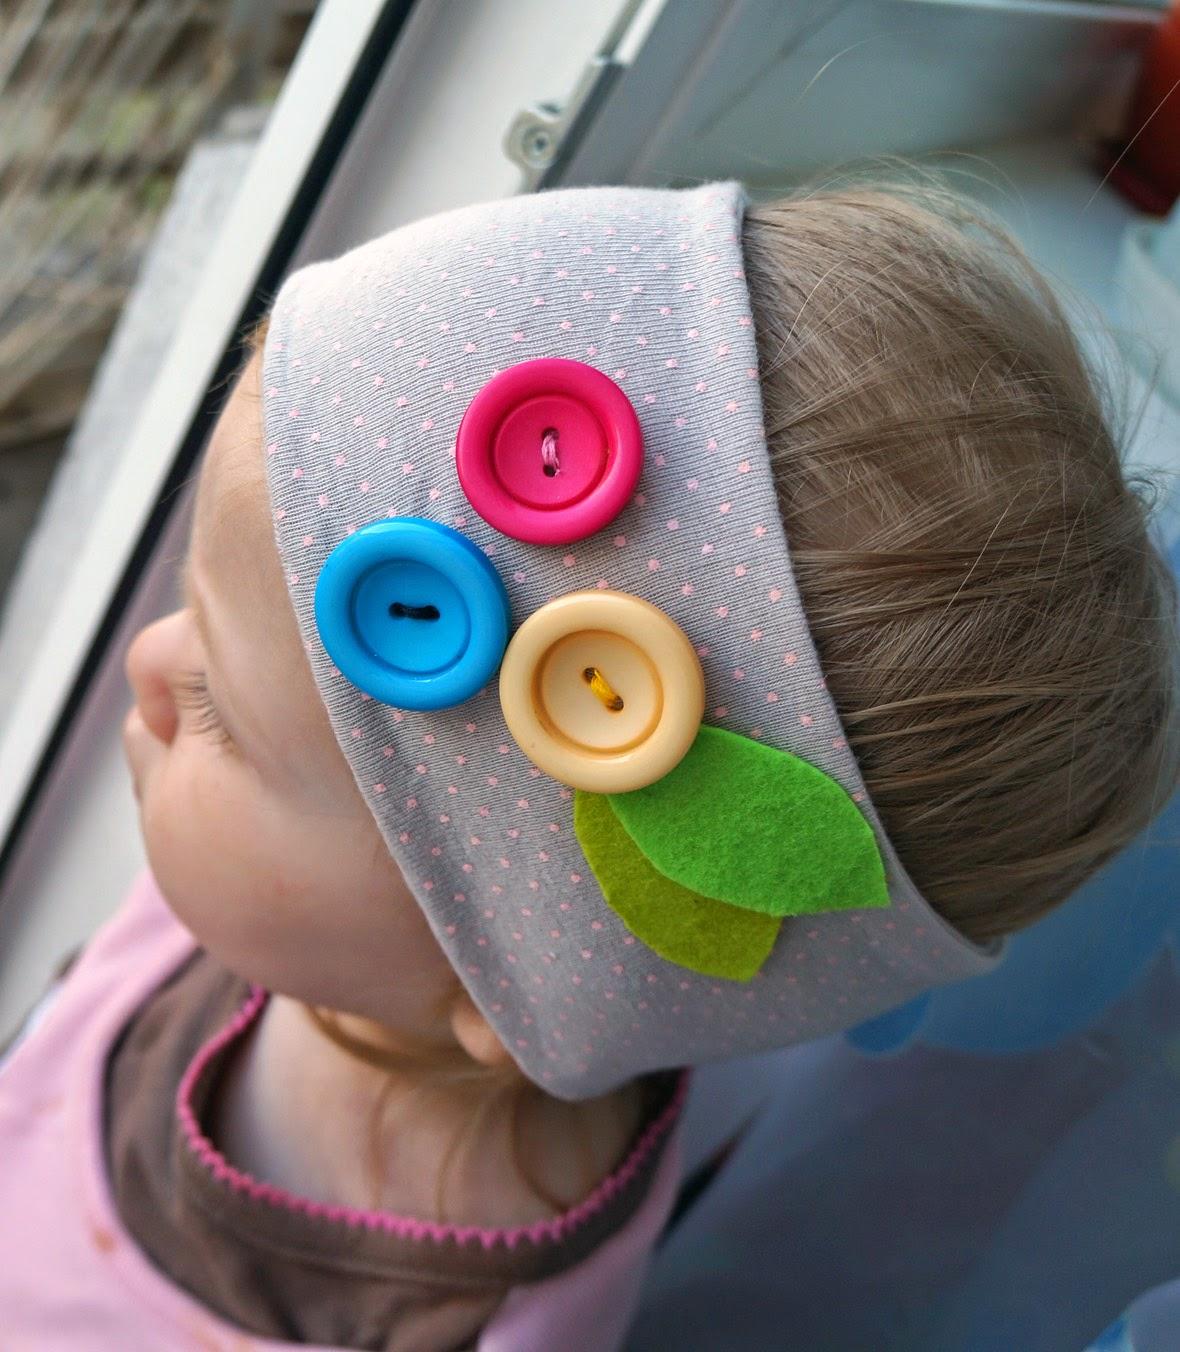 повязка на голову для девочки